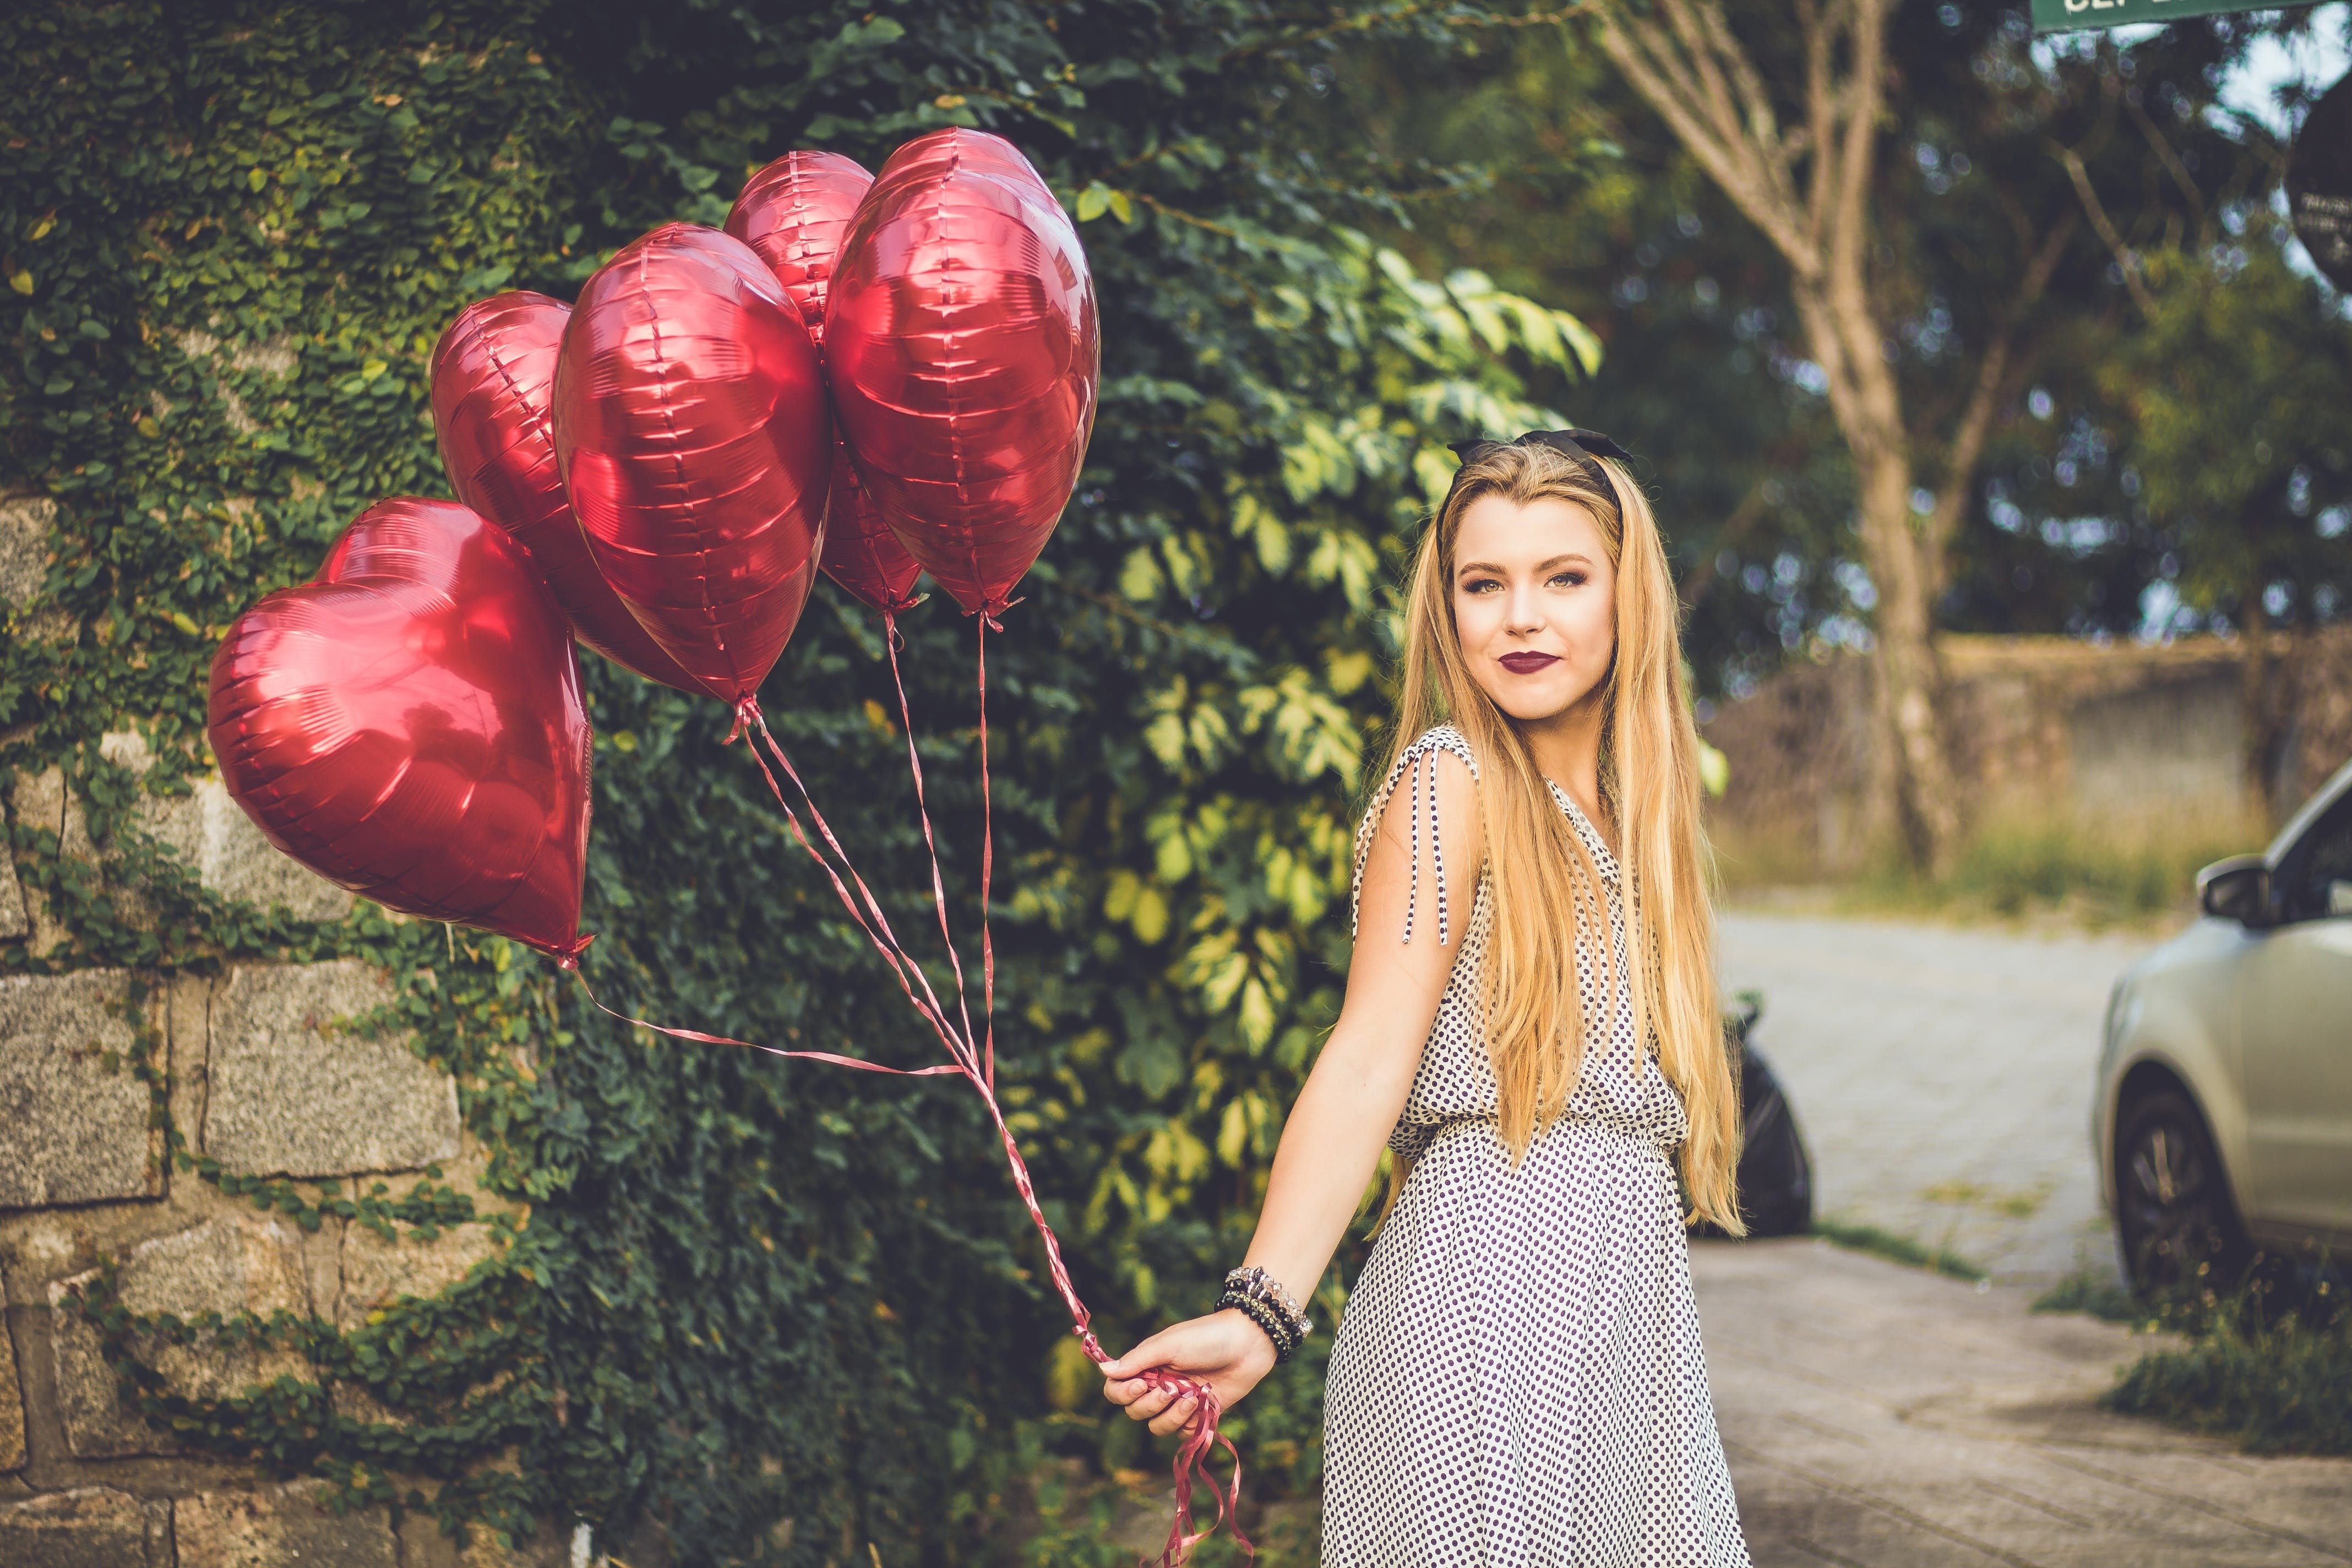 Woman Wearing Grey Dress Holding Heart Balloons